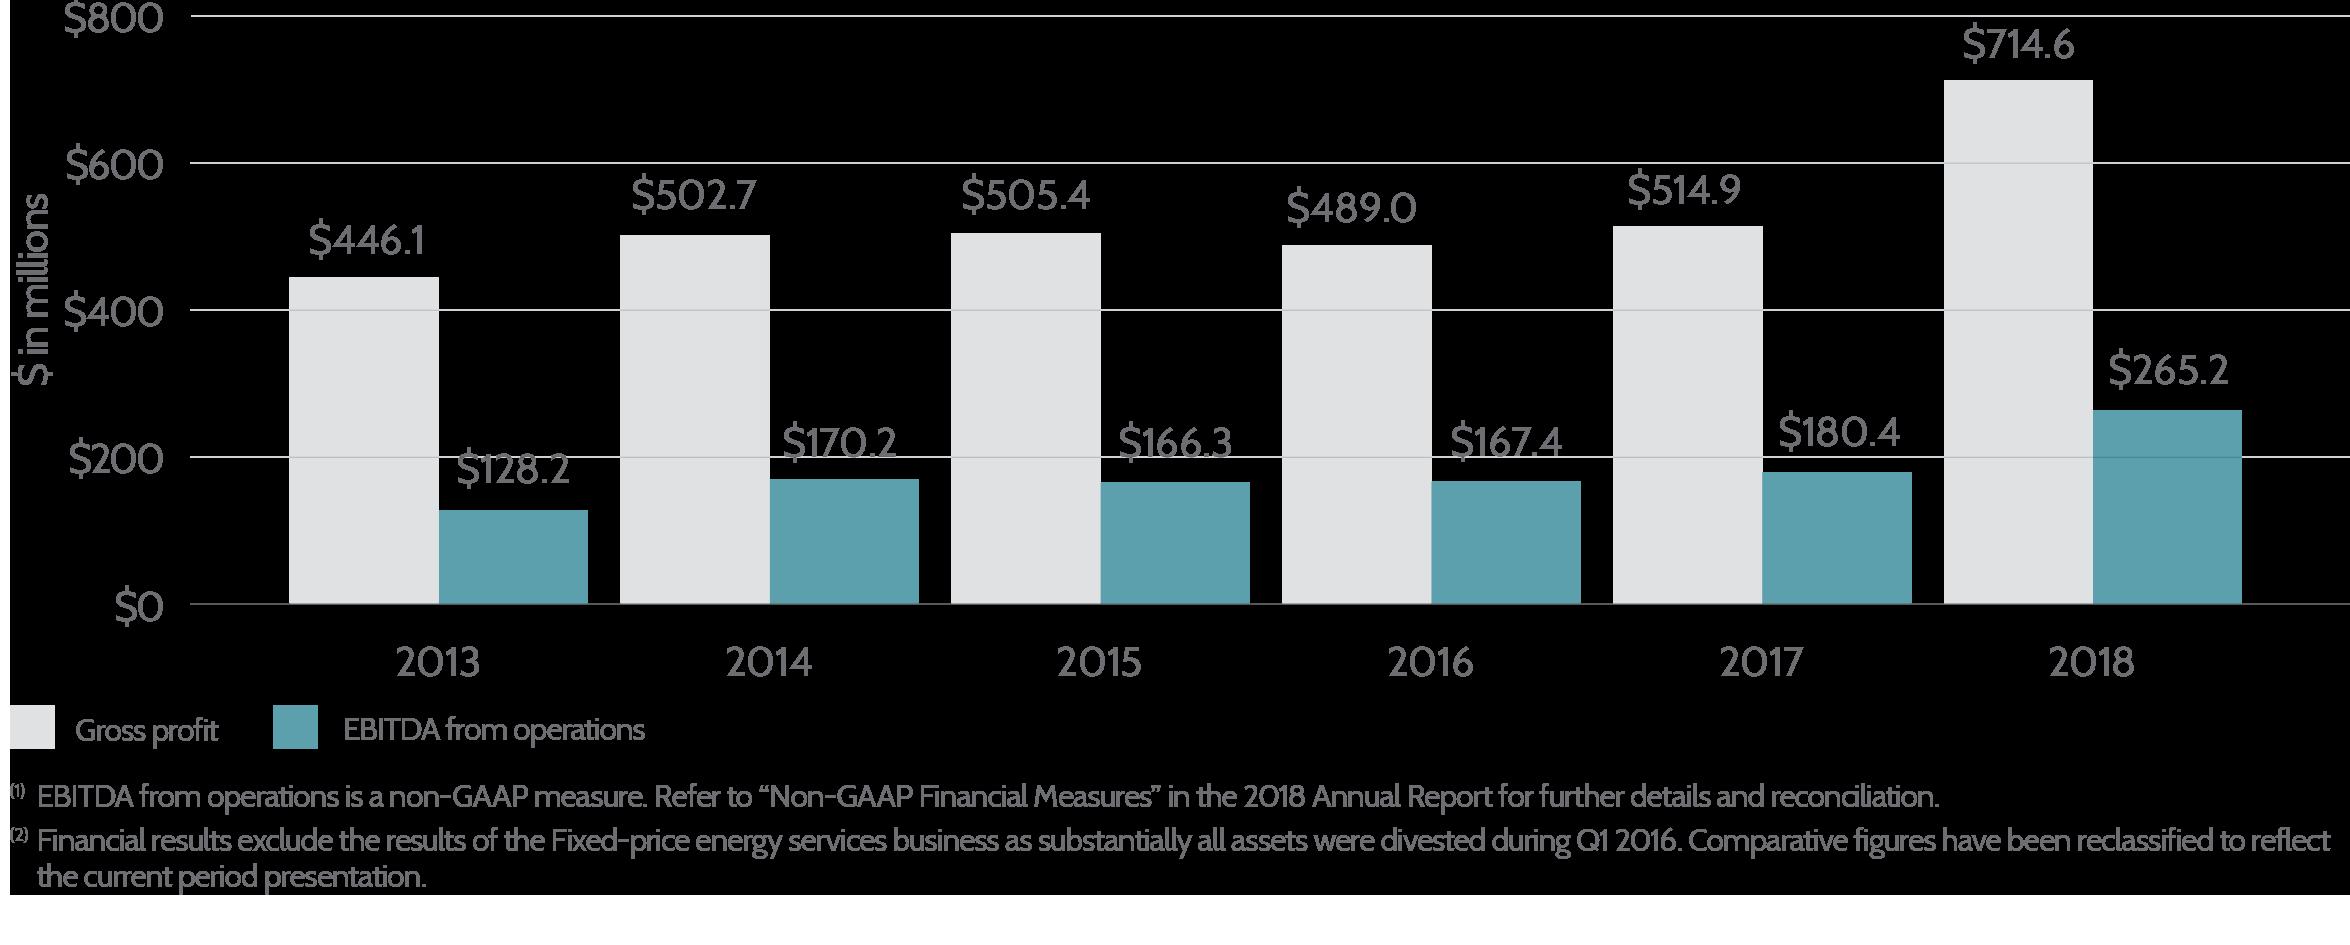 Energy_Distribution_Gross_Profit_EBITDA